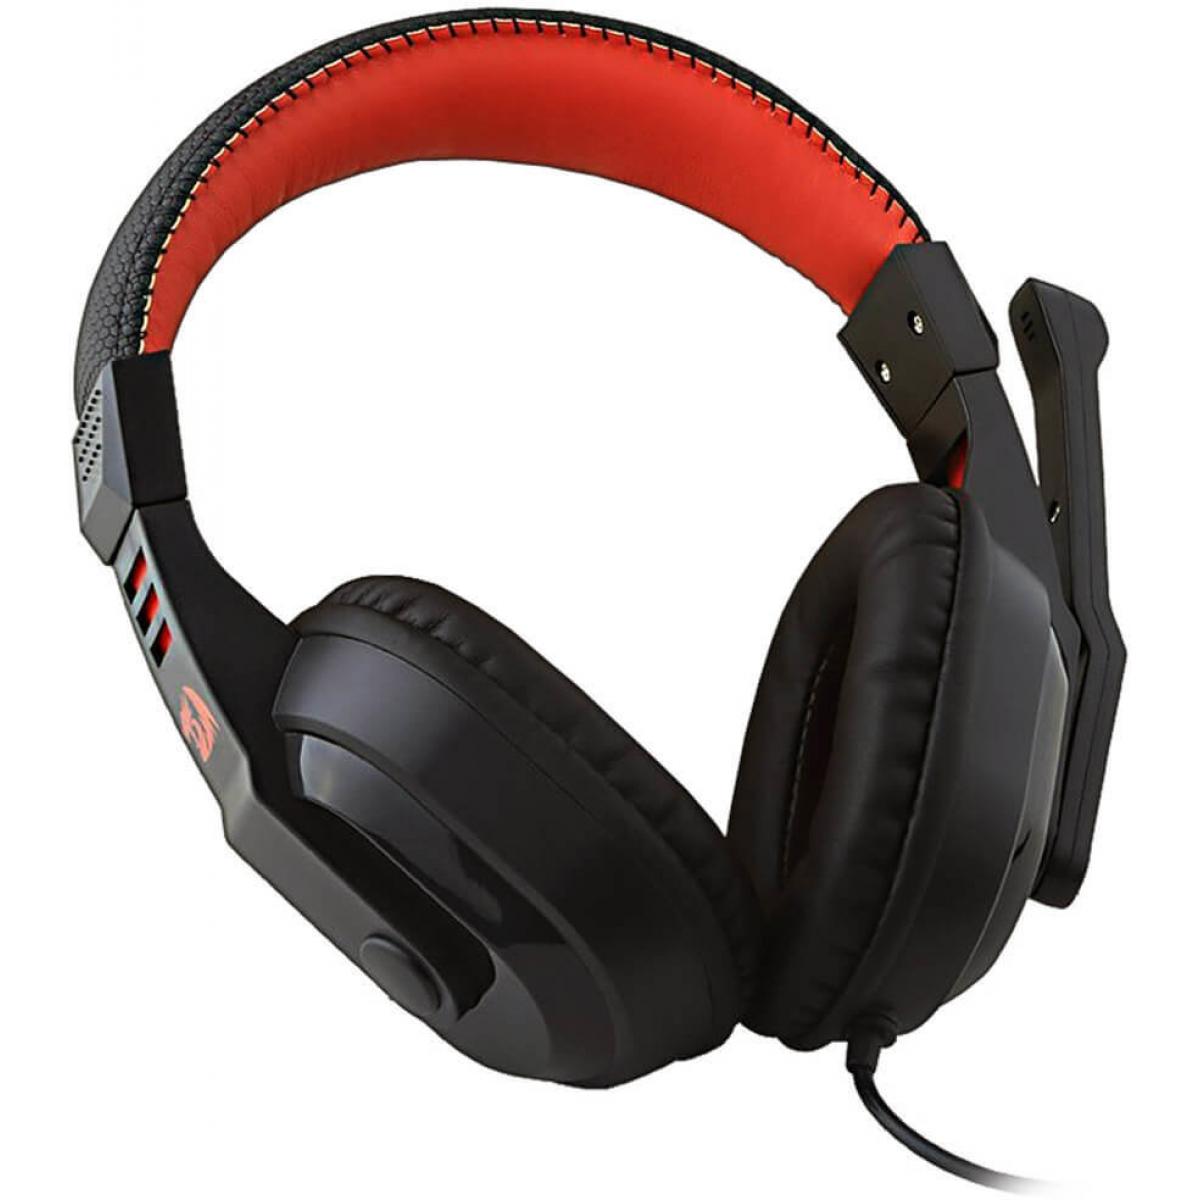 Headset Redragon Garuda H101